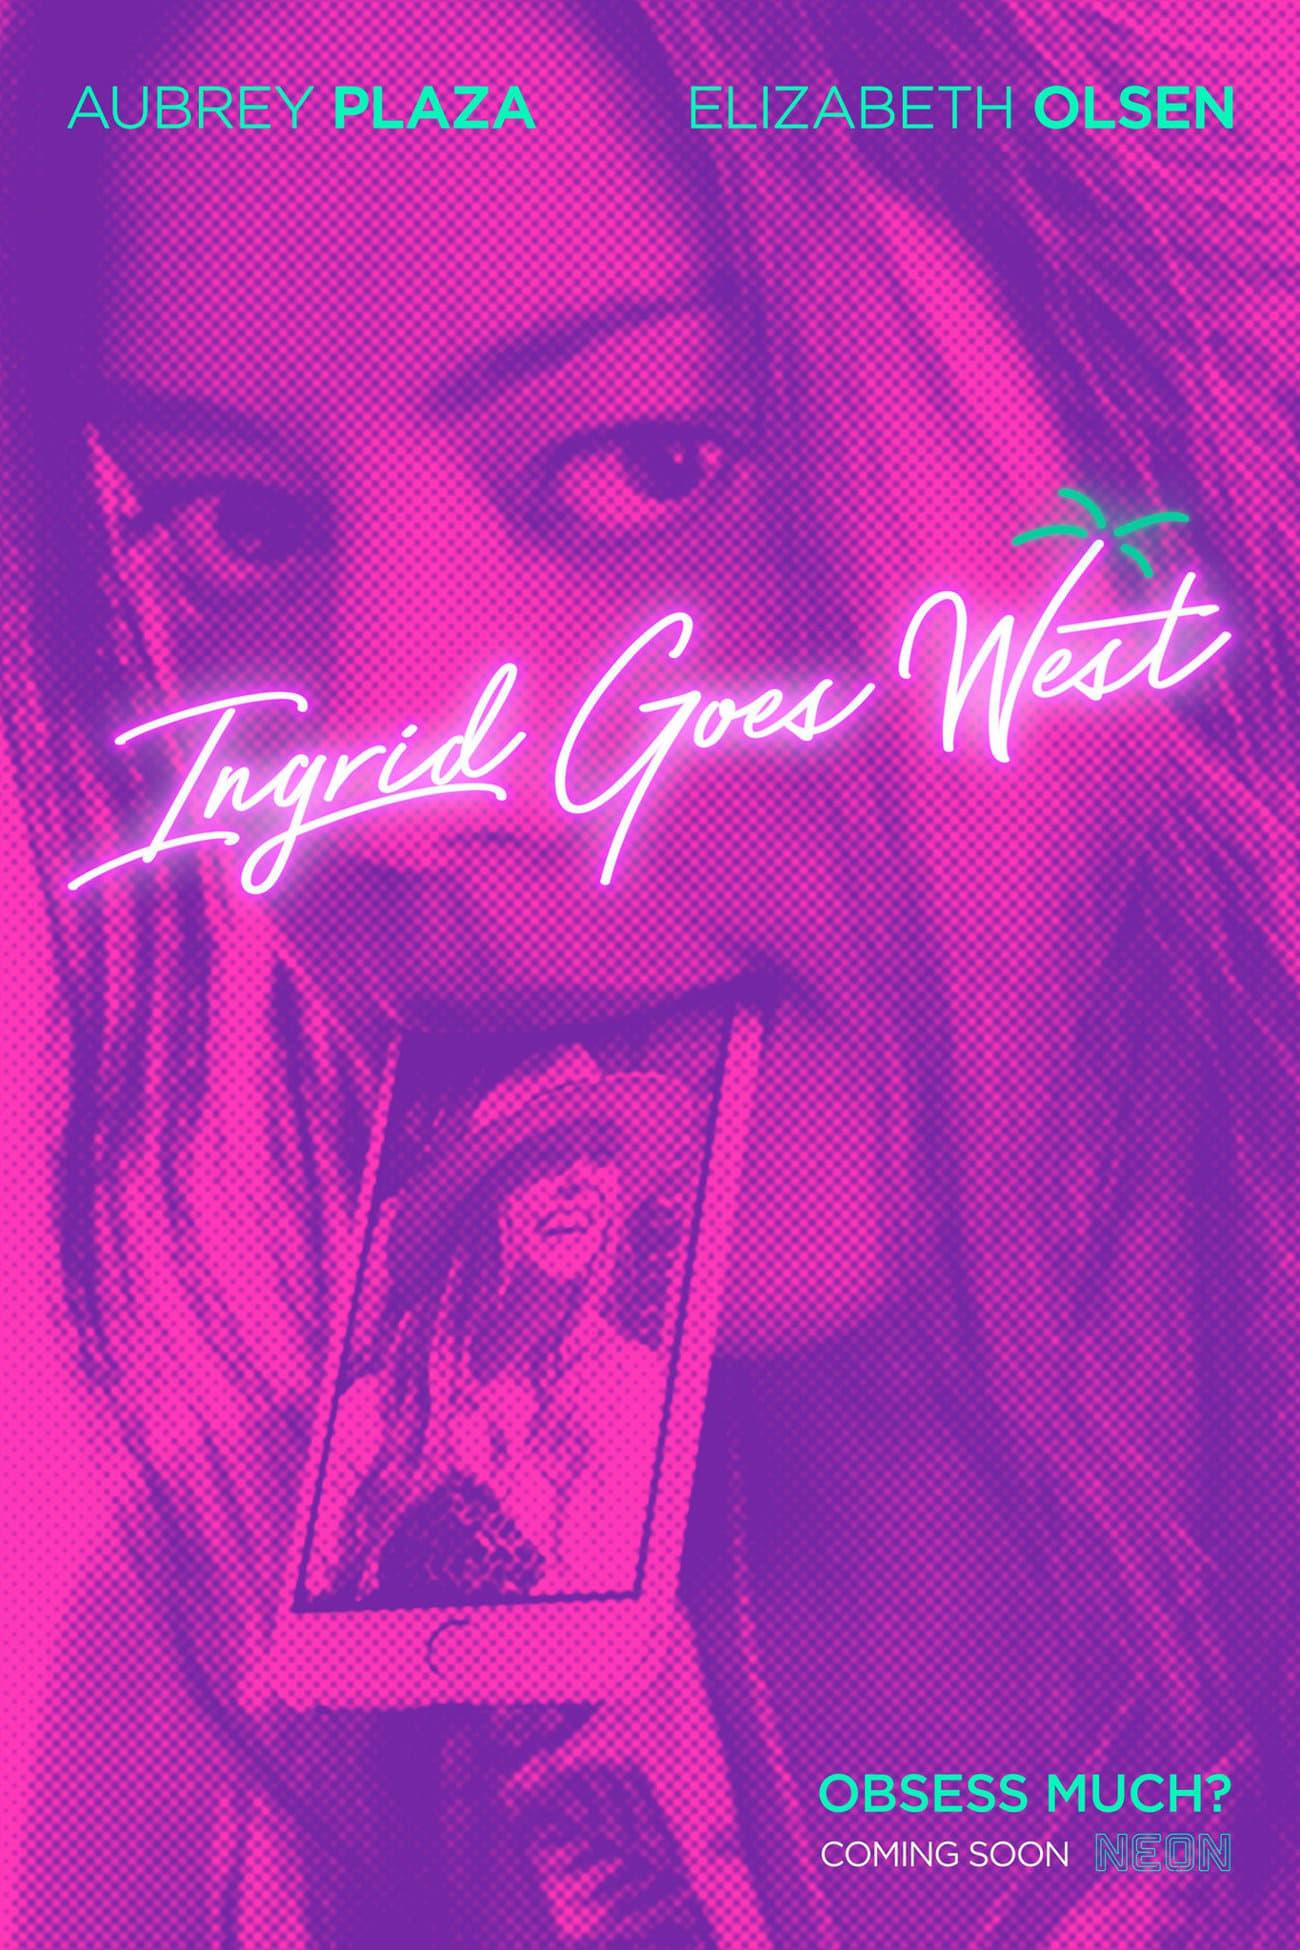 Assistir Ingrid Goes West Legendado Online Legendado 1080p